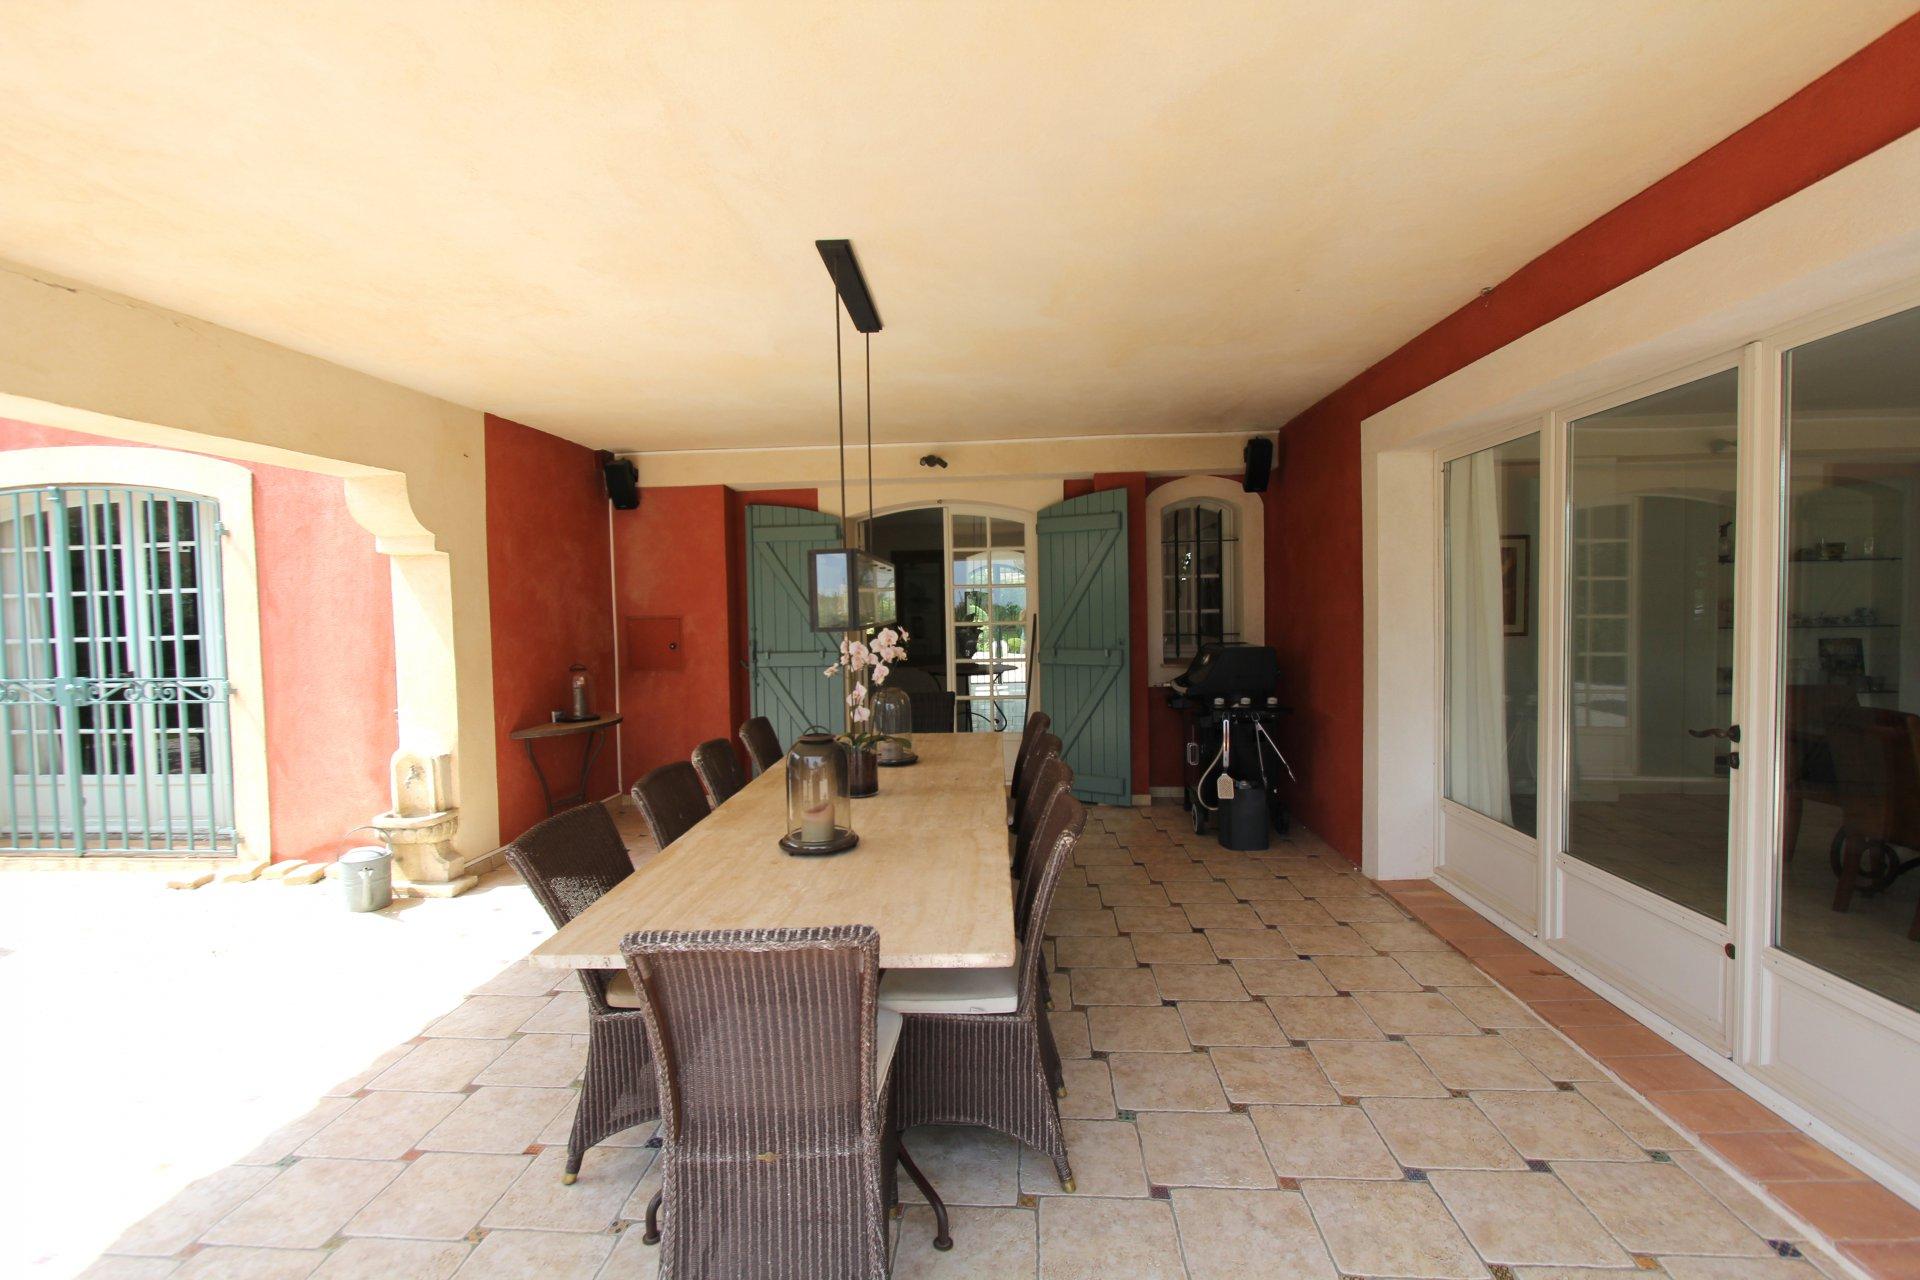 Annuncio affitto stagionale casa mouans sartoux 06370 7 for Camere affitto